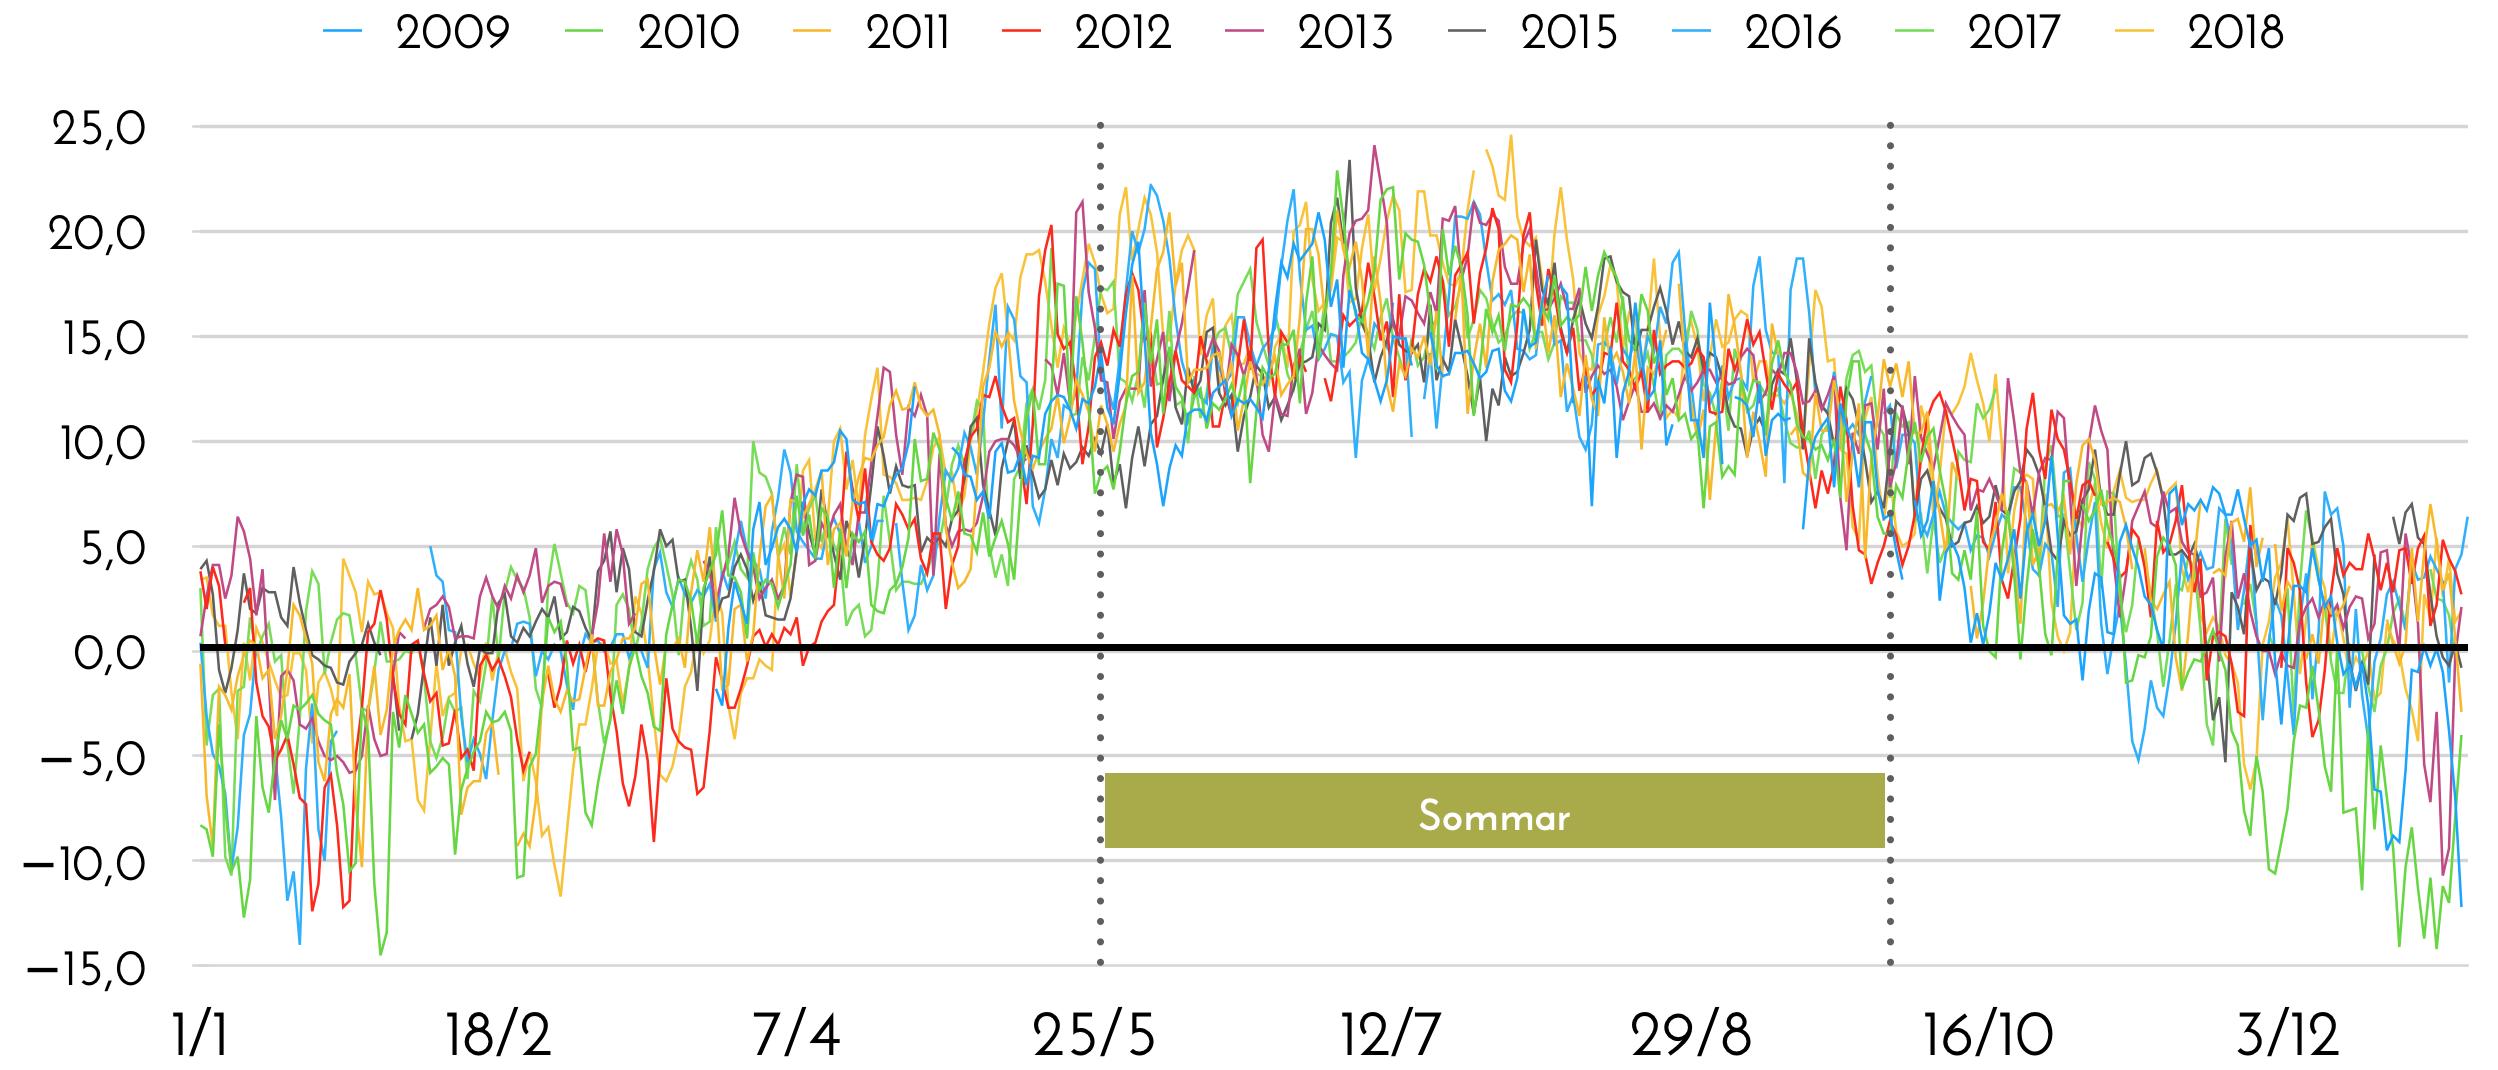 Dygnsmedeltemperatur i Sundhult 2009-2018